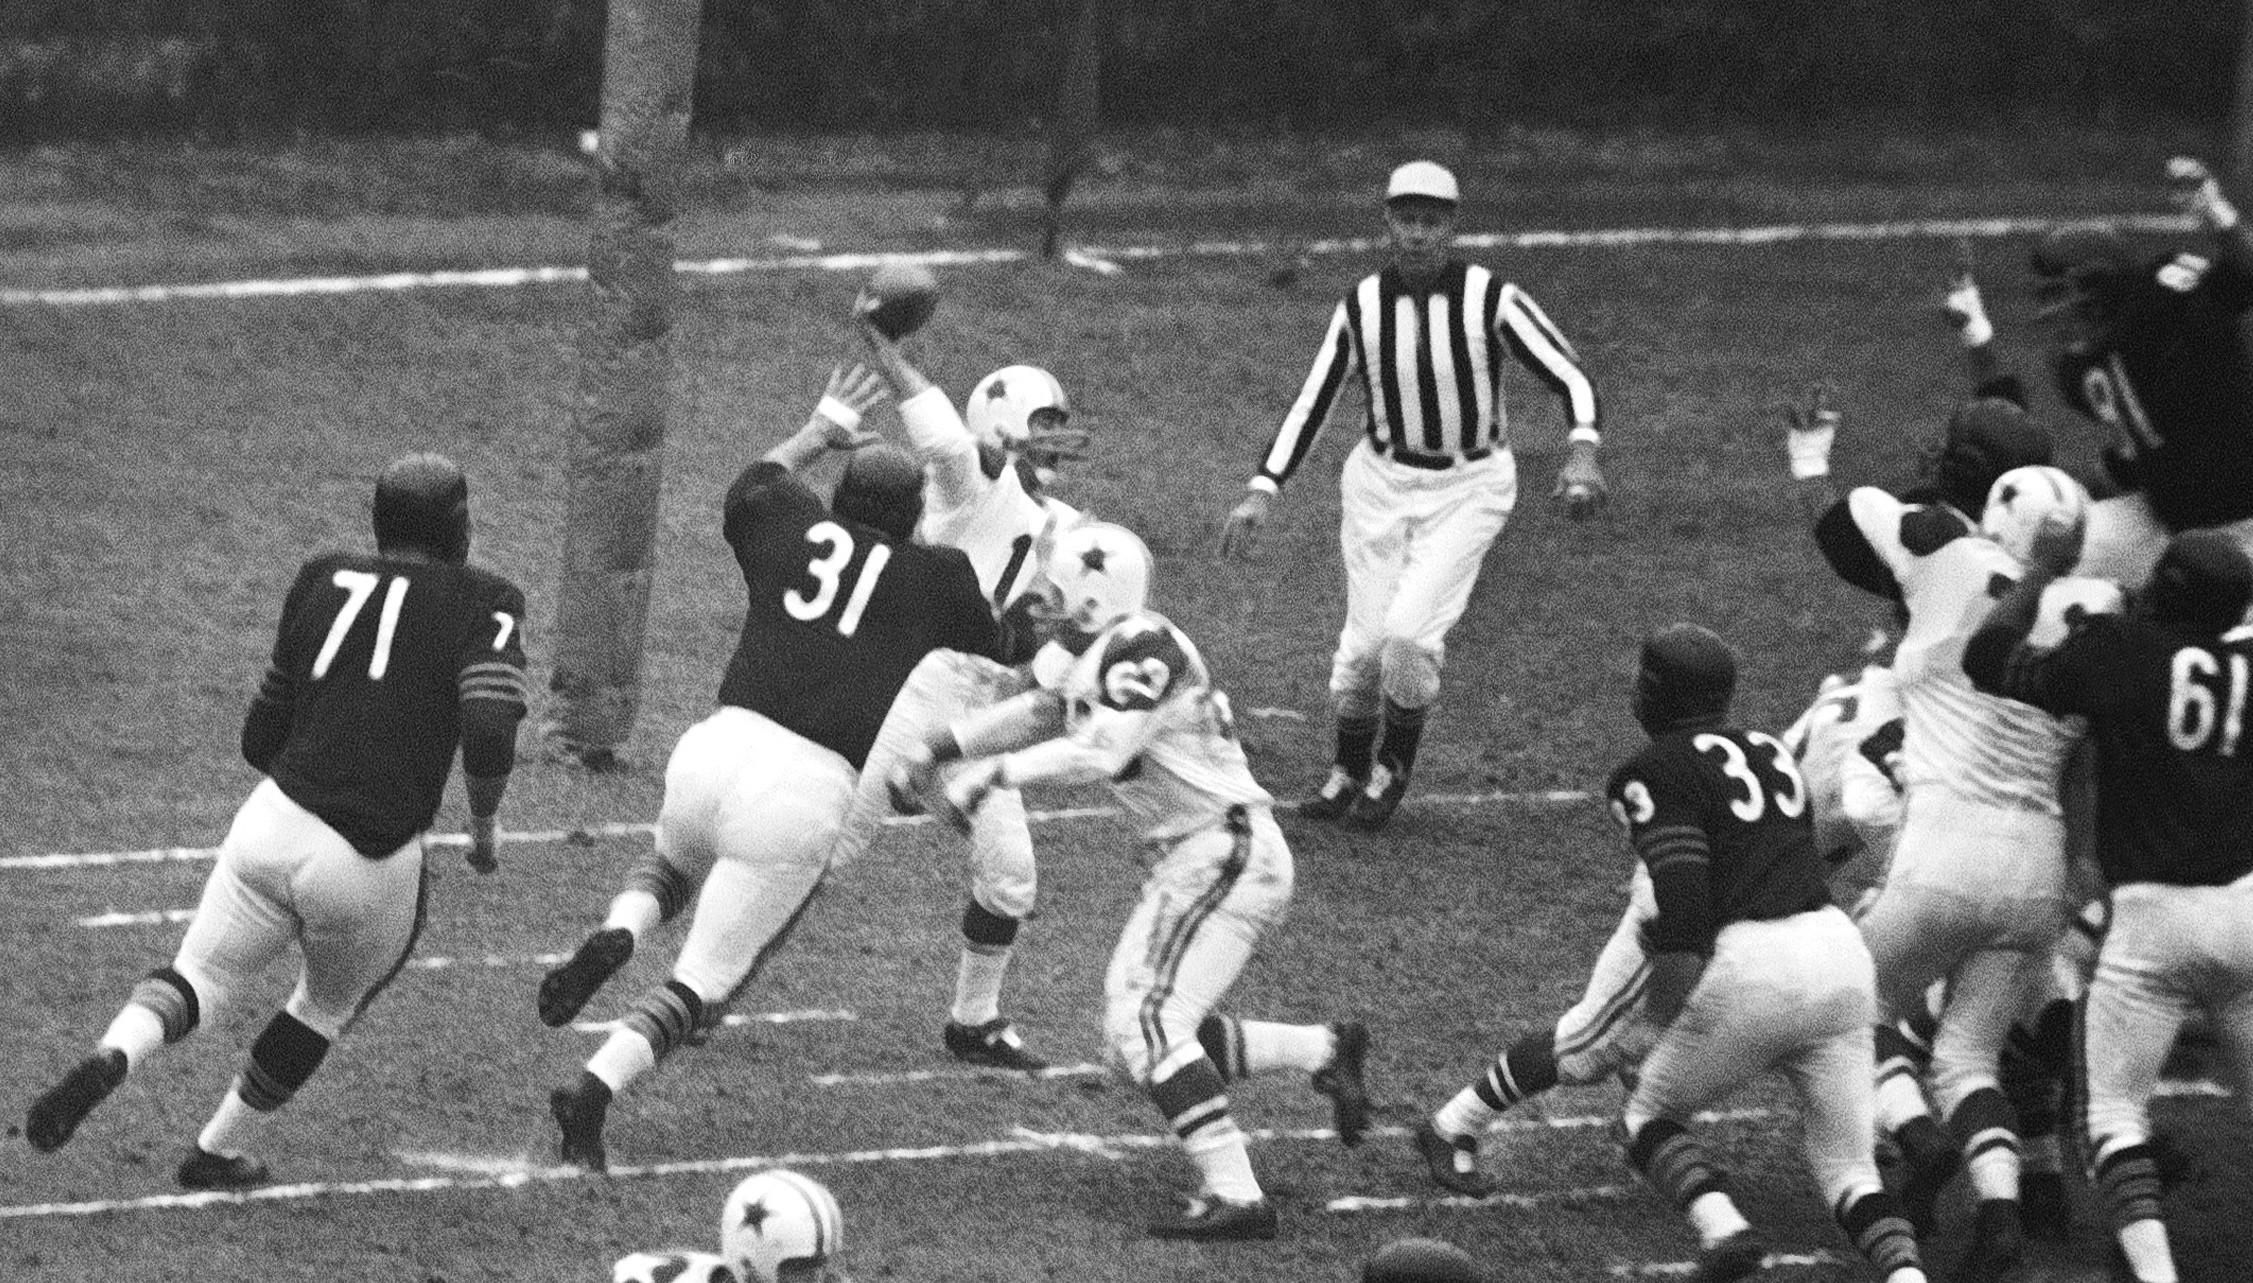 Joe Fortunato and 1963 Chicago Bears